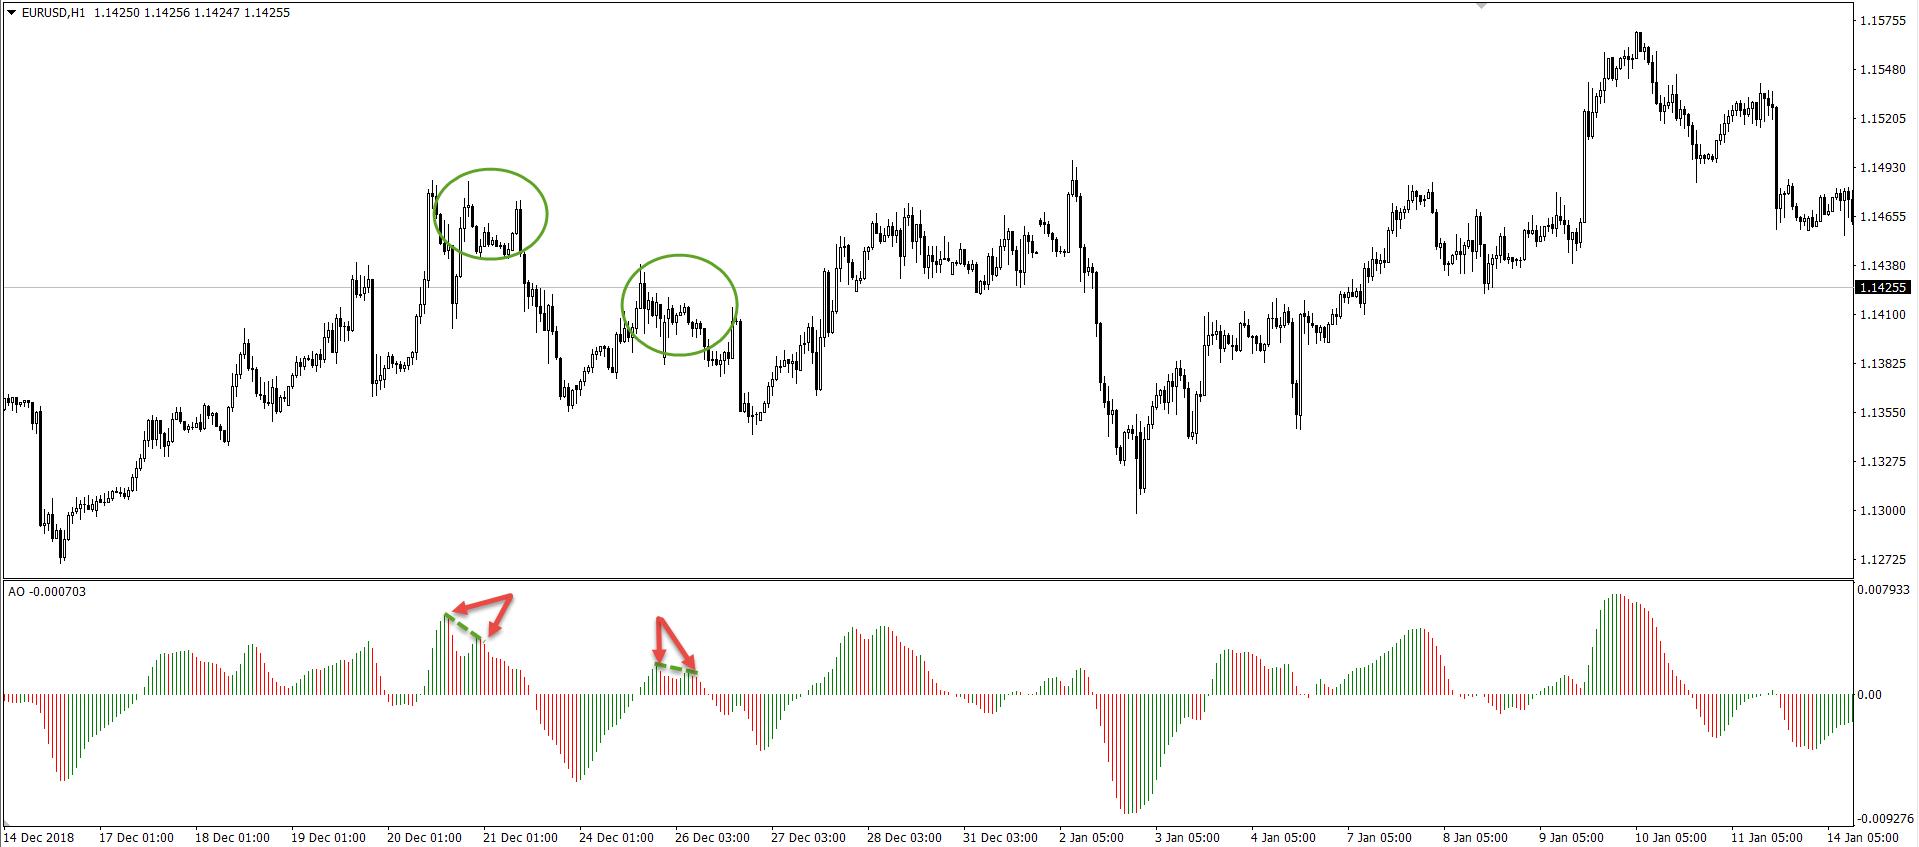 Measure Market Momentum Using the Awesome Oscillator 4